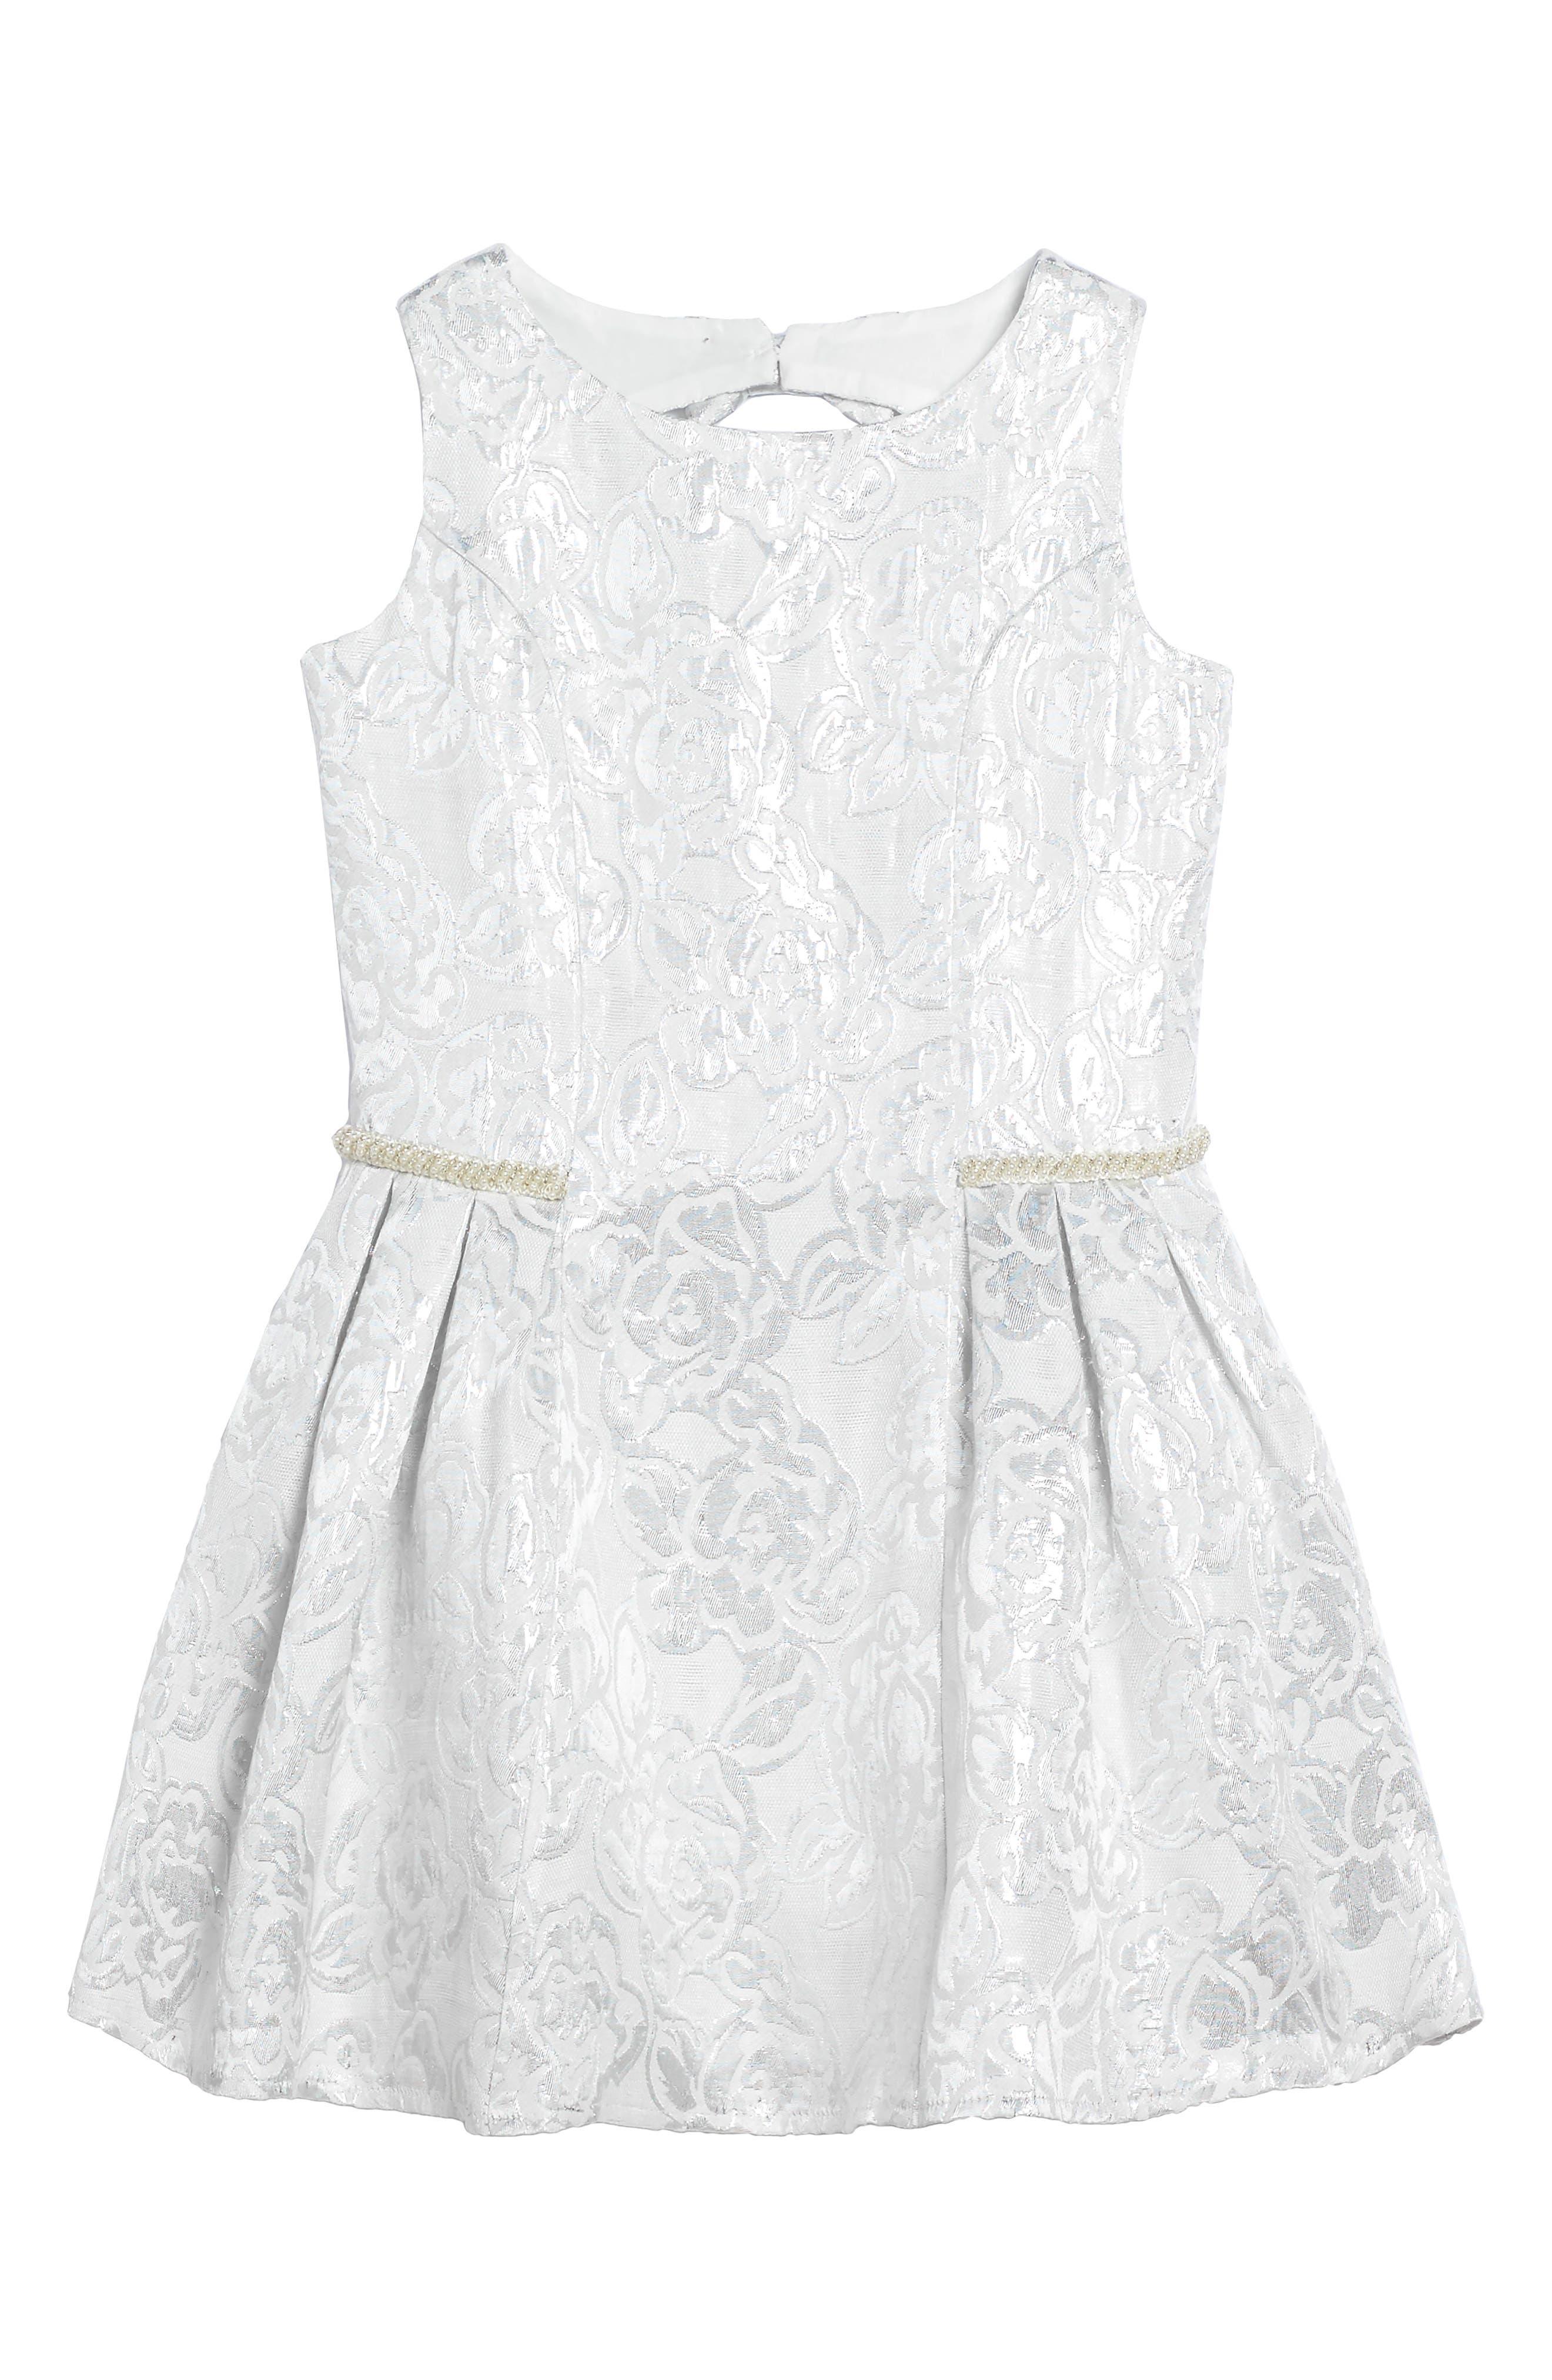 Princess Embroidered Dress,                             Main thumbnail 1, color,                             Silver